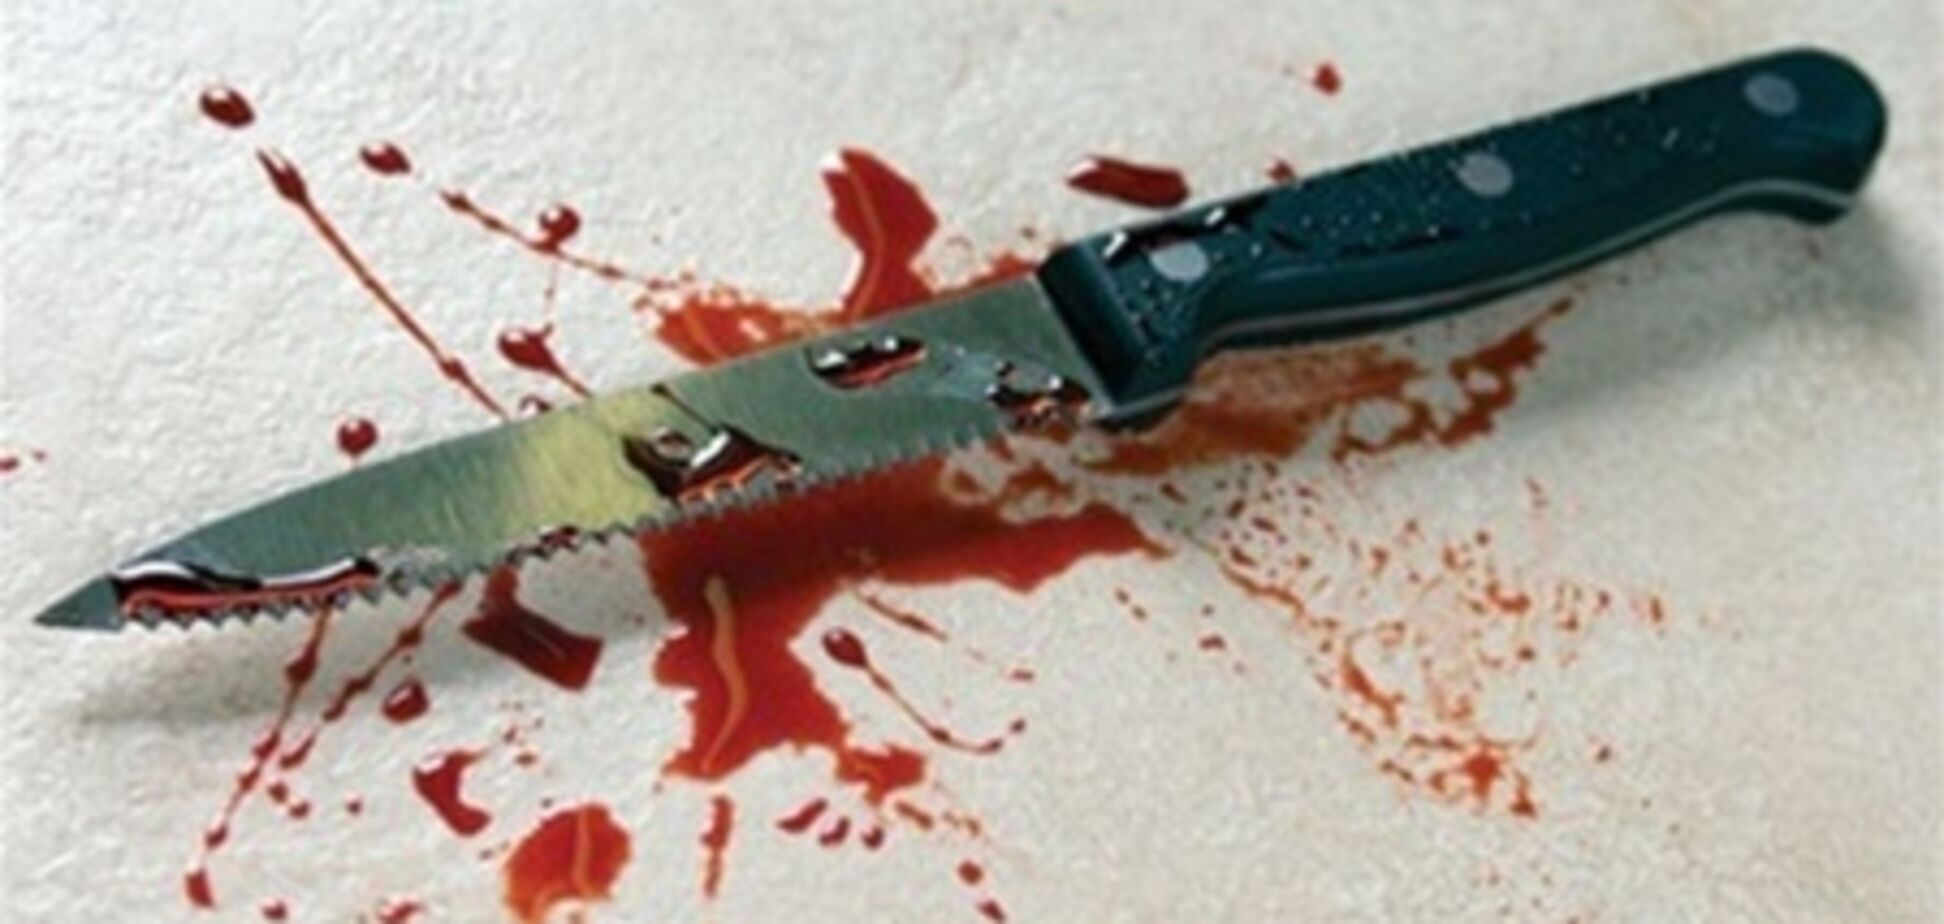 МВД: 'черниговский убийца' - не милиционер